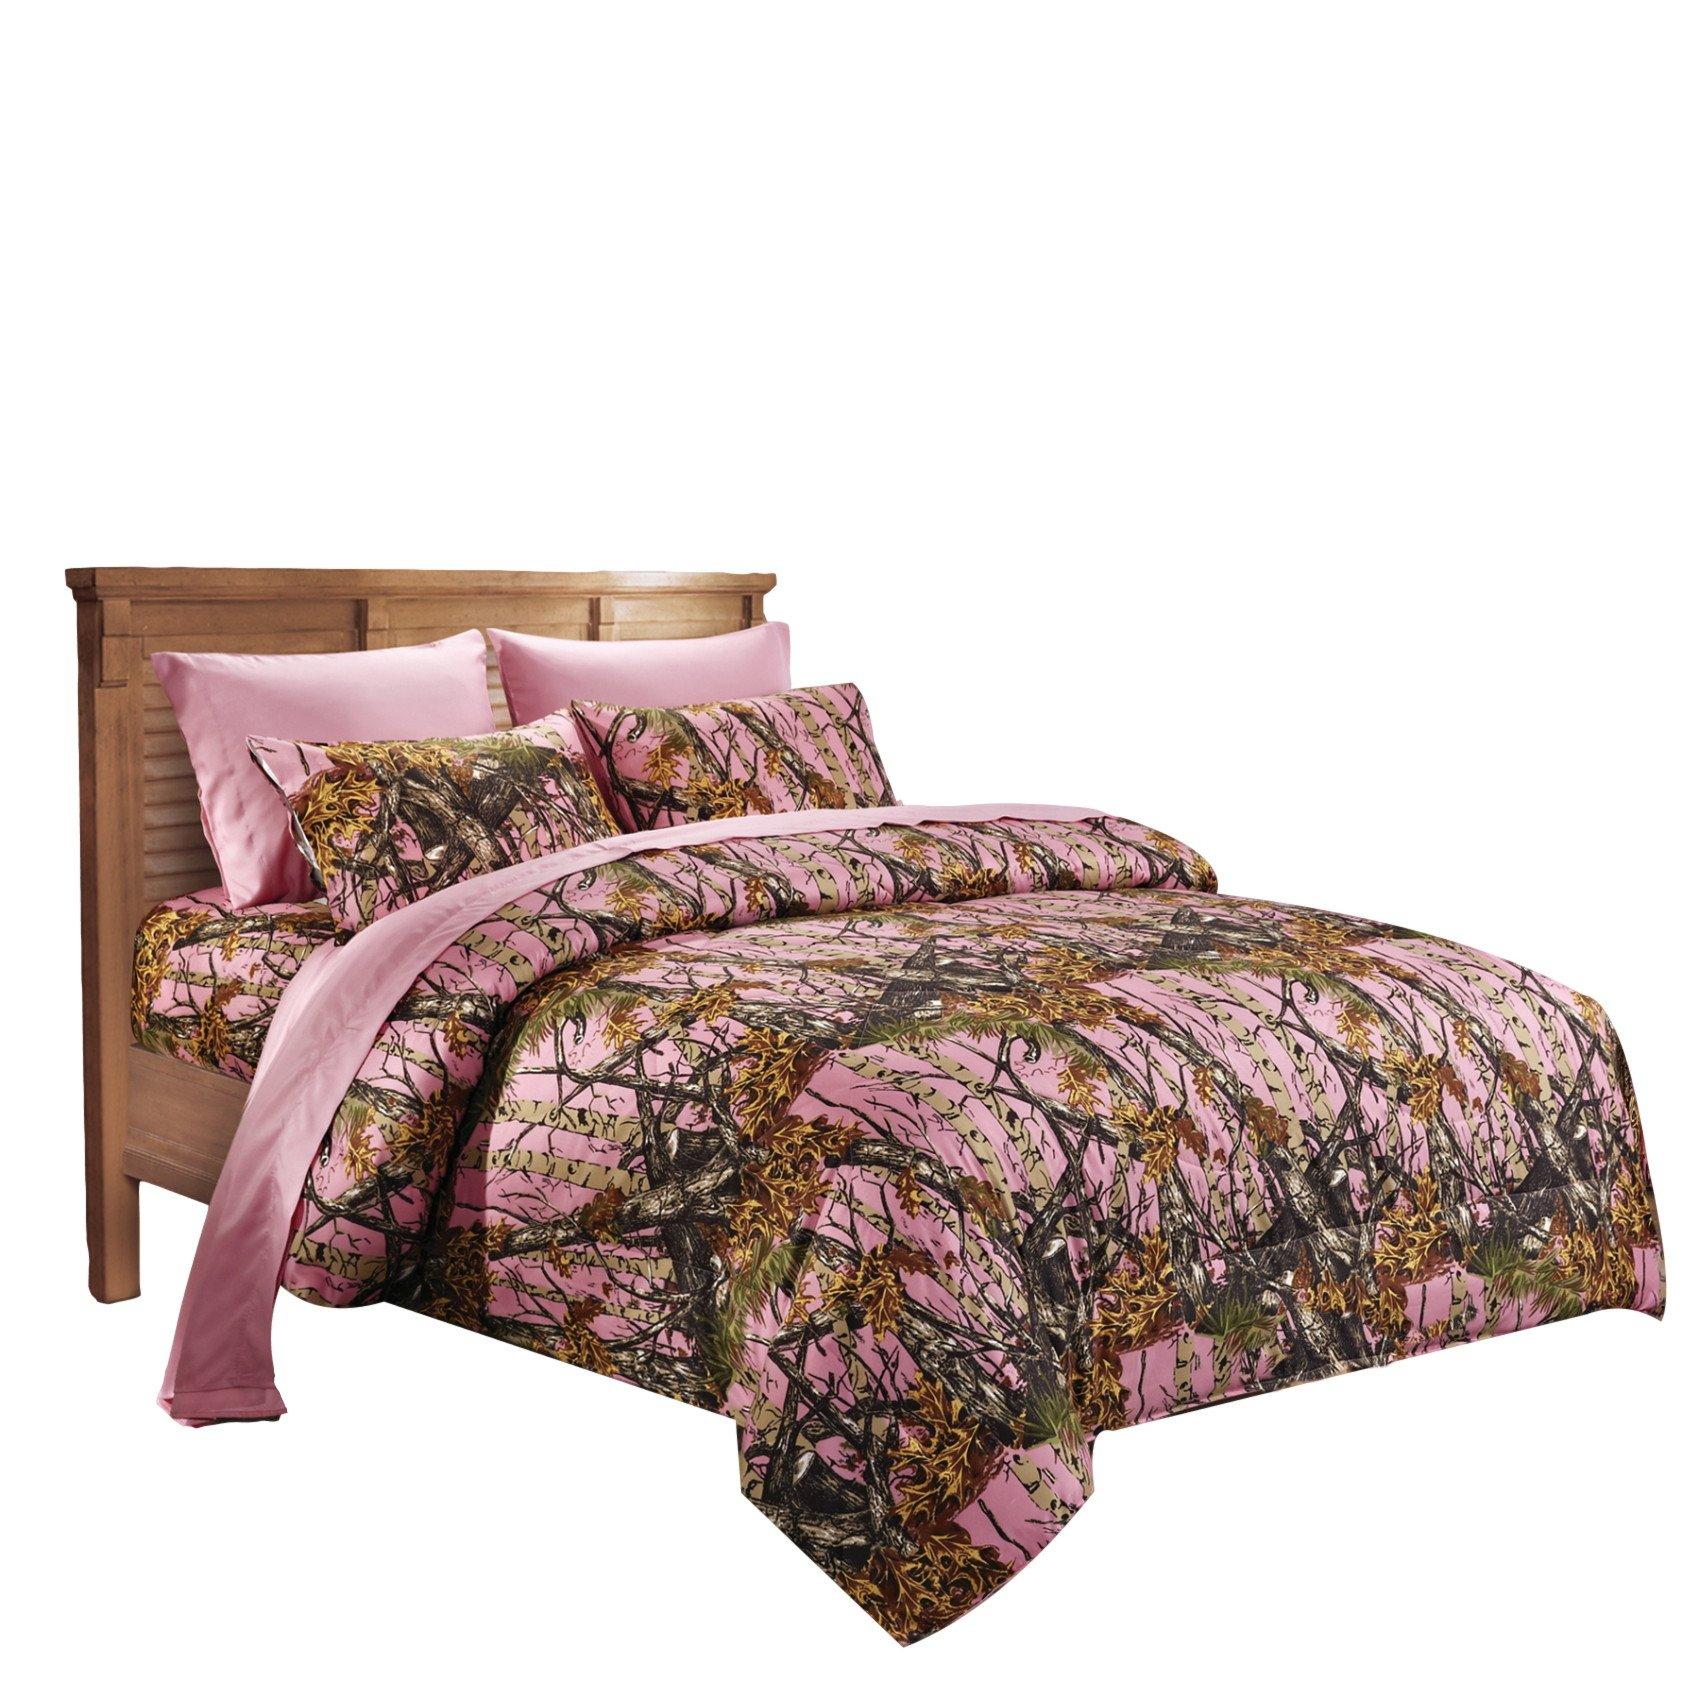 20 Lakes Pink Woodland Hunter Camo Microfiber Comforter Spread - Queen/Full Size